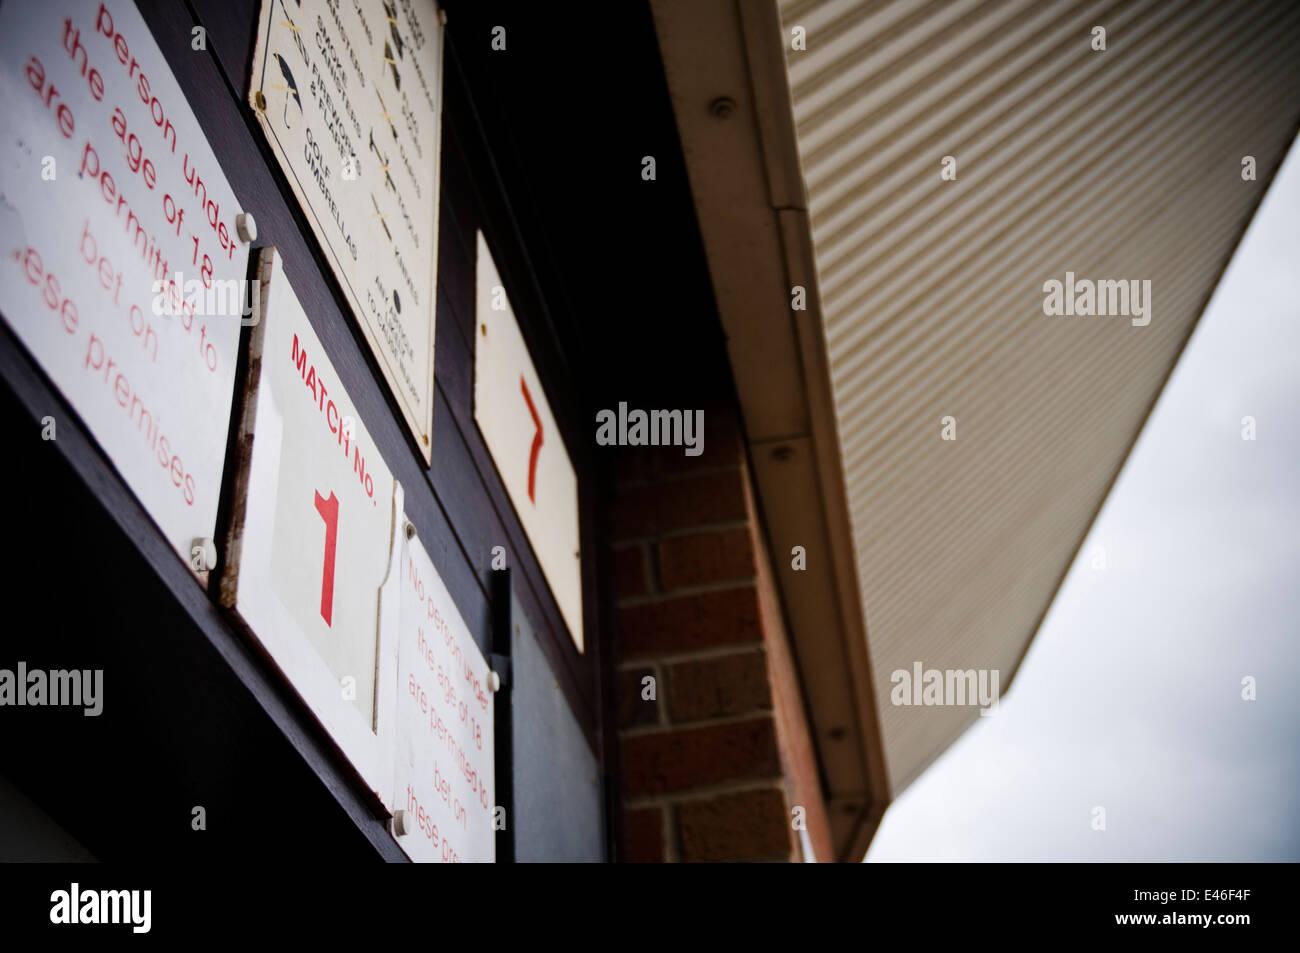 A turnstile on the opening day of the English football season at Sunderland AFC's Stadium of Light - Stock Image